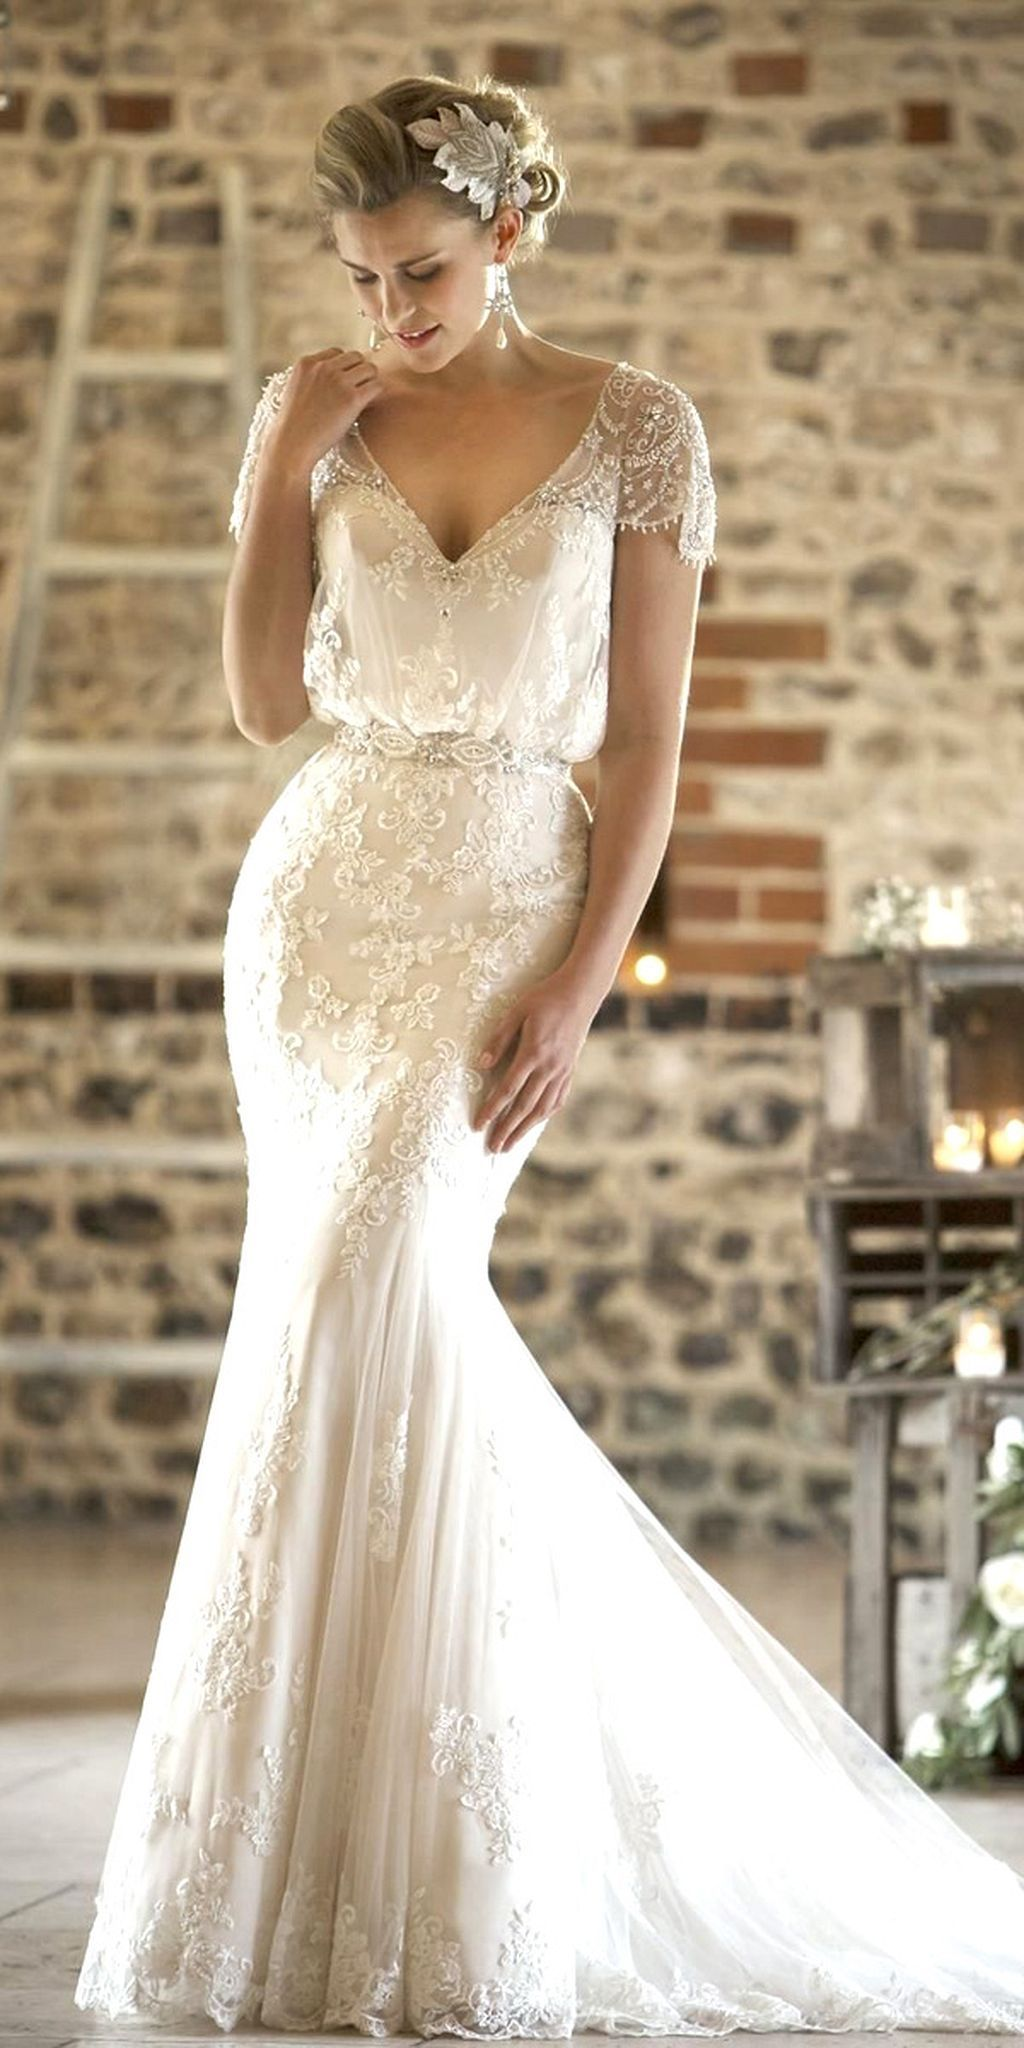 Vintage wedding dress ideas wedding pinterest wedding